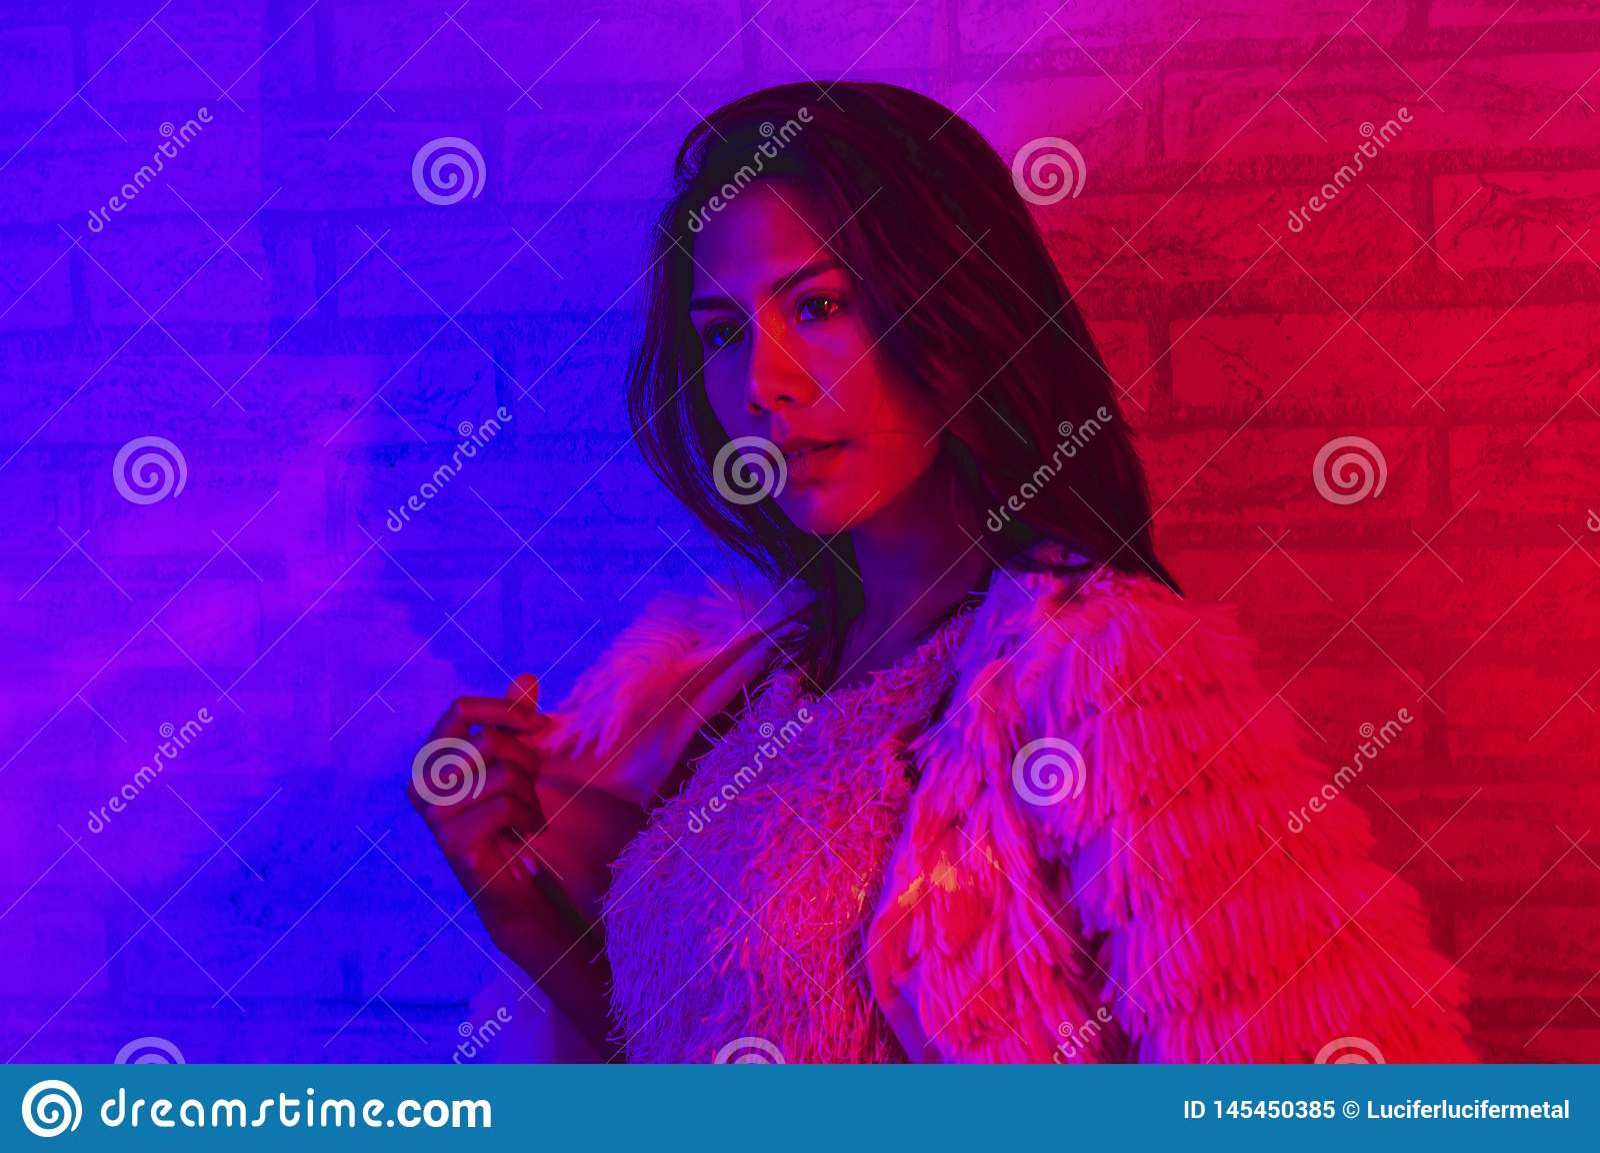 baby Gutscheincode exquisiter Stil Mode De Portrait D'une Femme Asiatique Dans La Lumi?re N?on ...